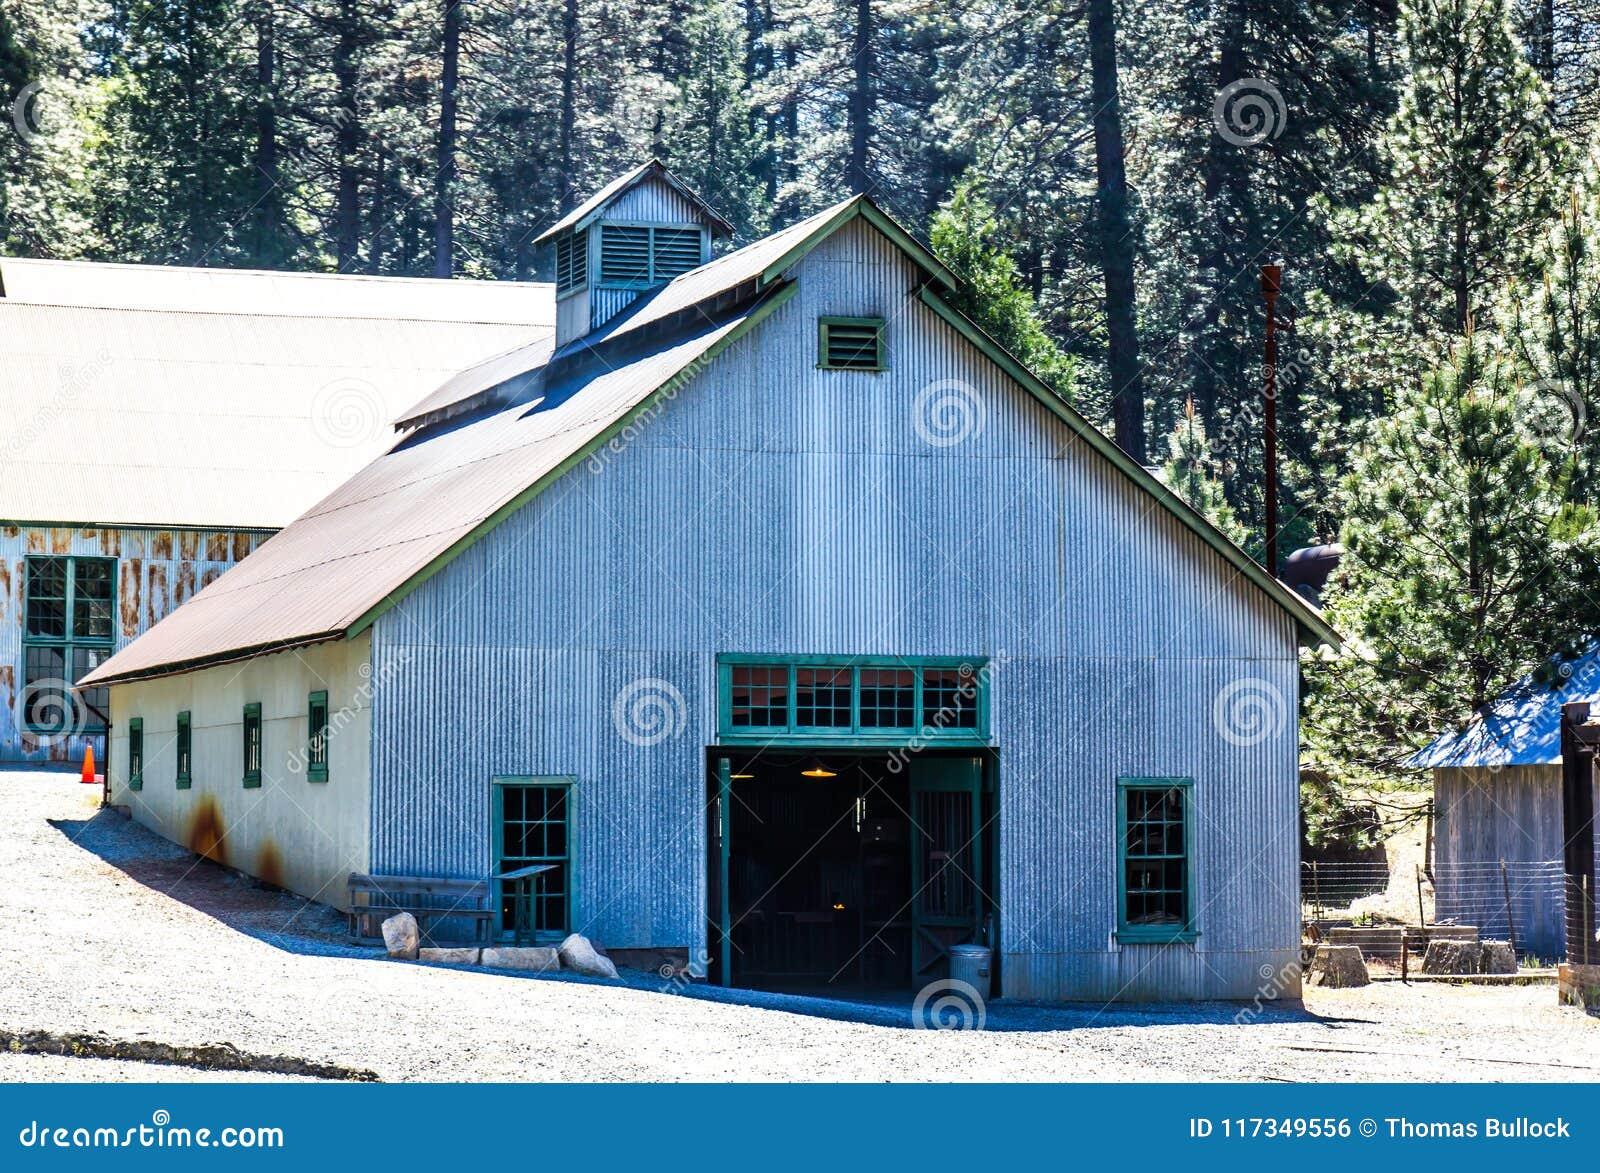 Tin Building In Mining Operations ondulato